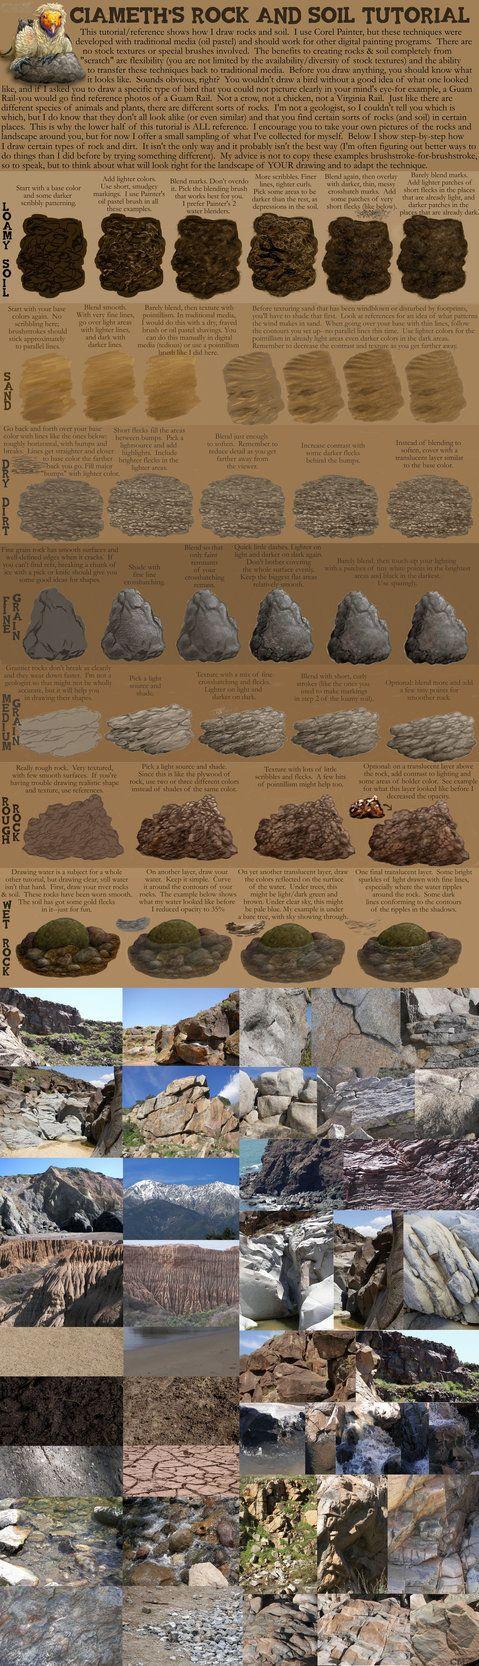 Ciameth's Rock Tutorial by Ciameth on deviantART via PinCG.com